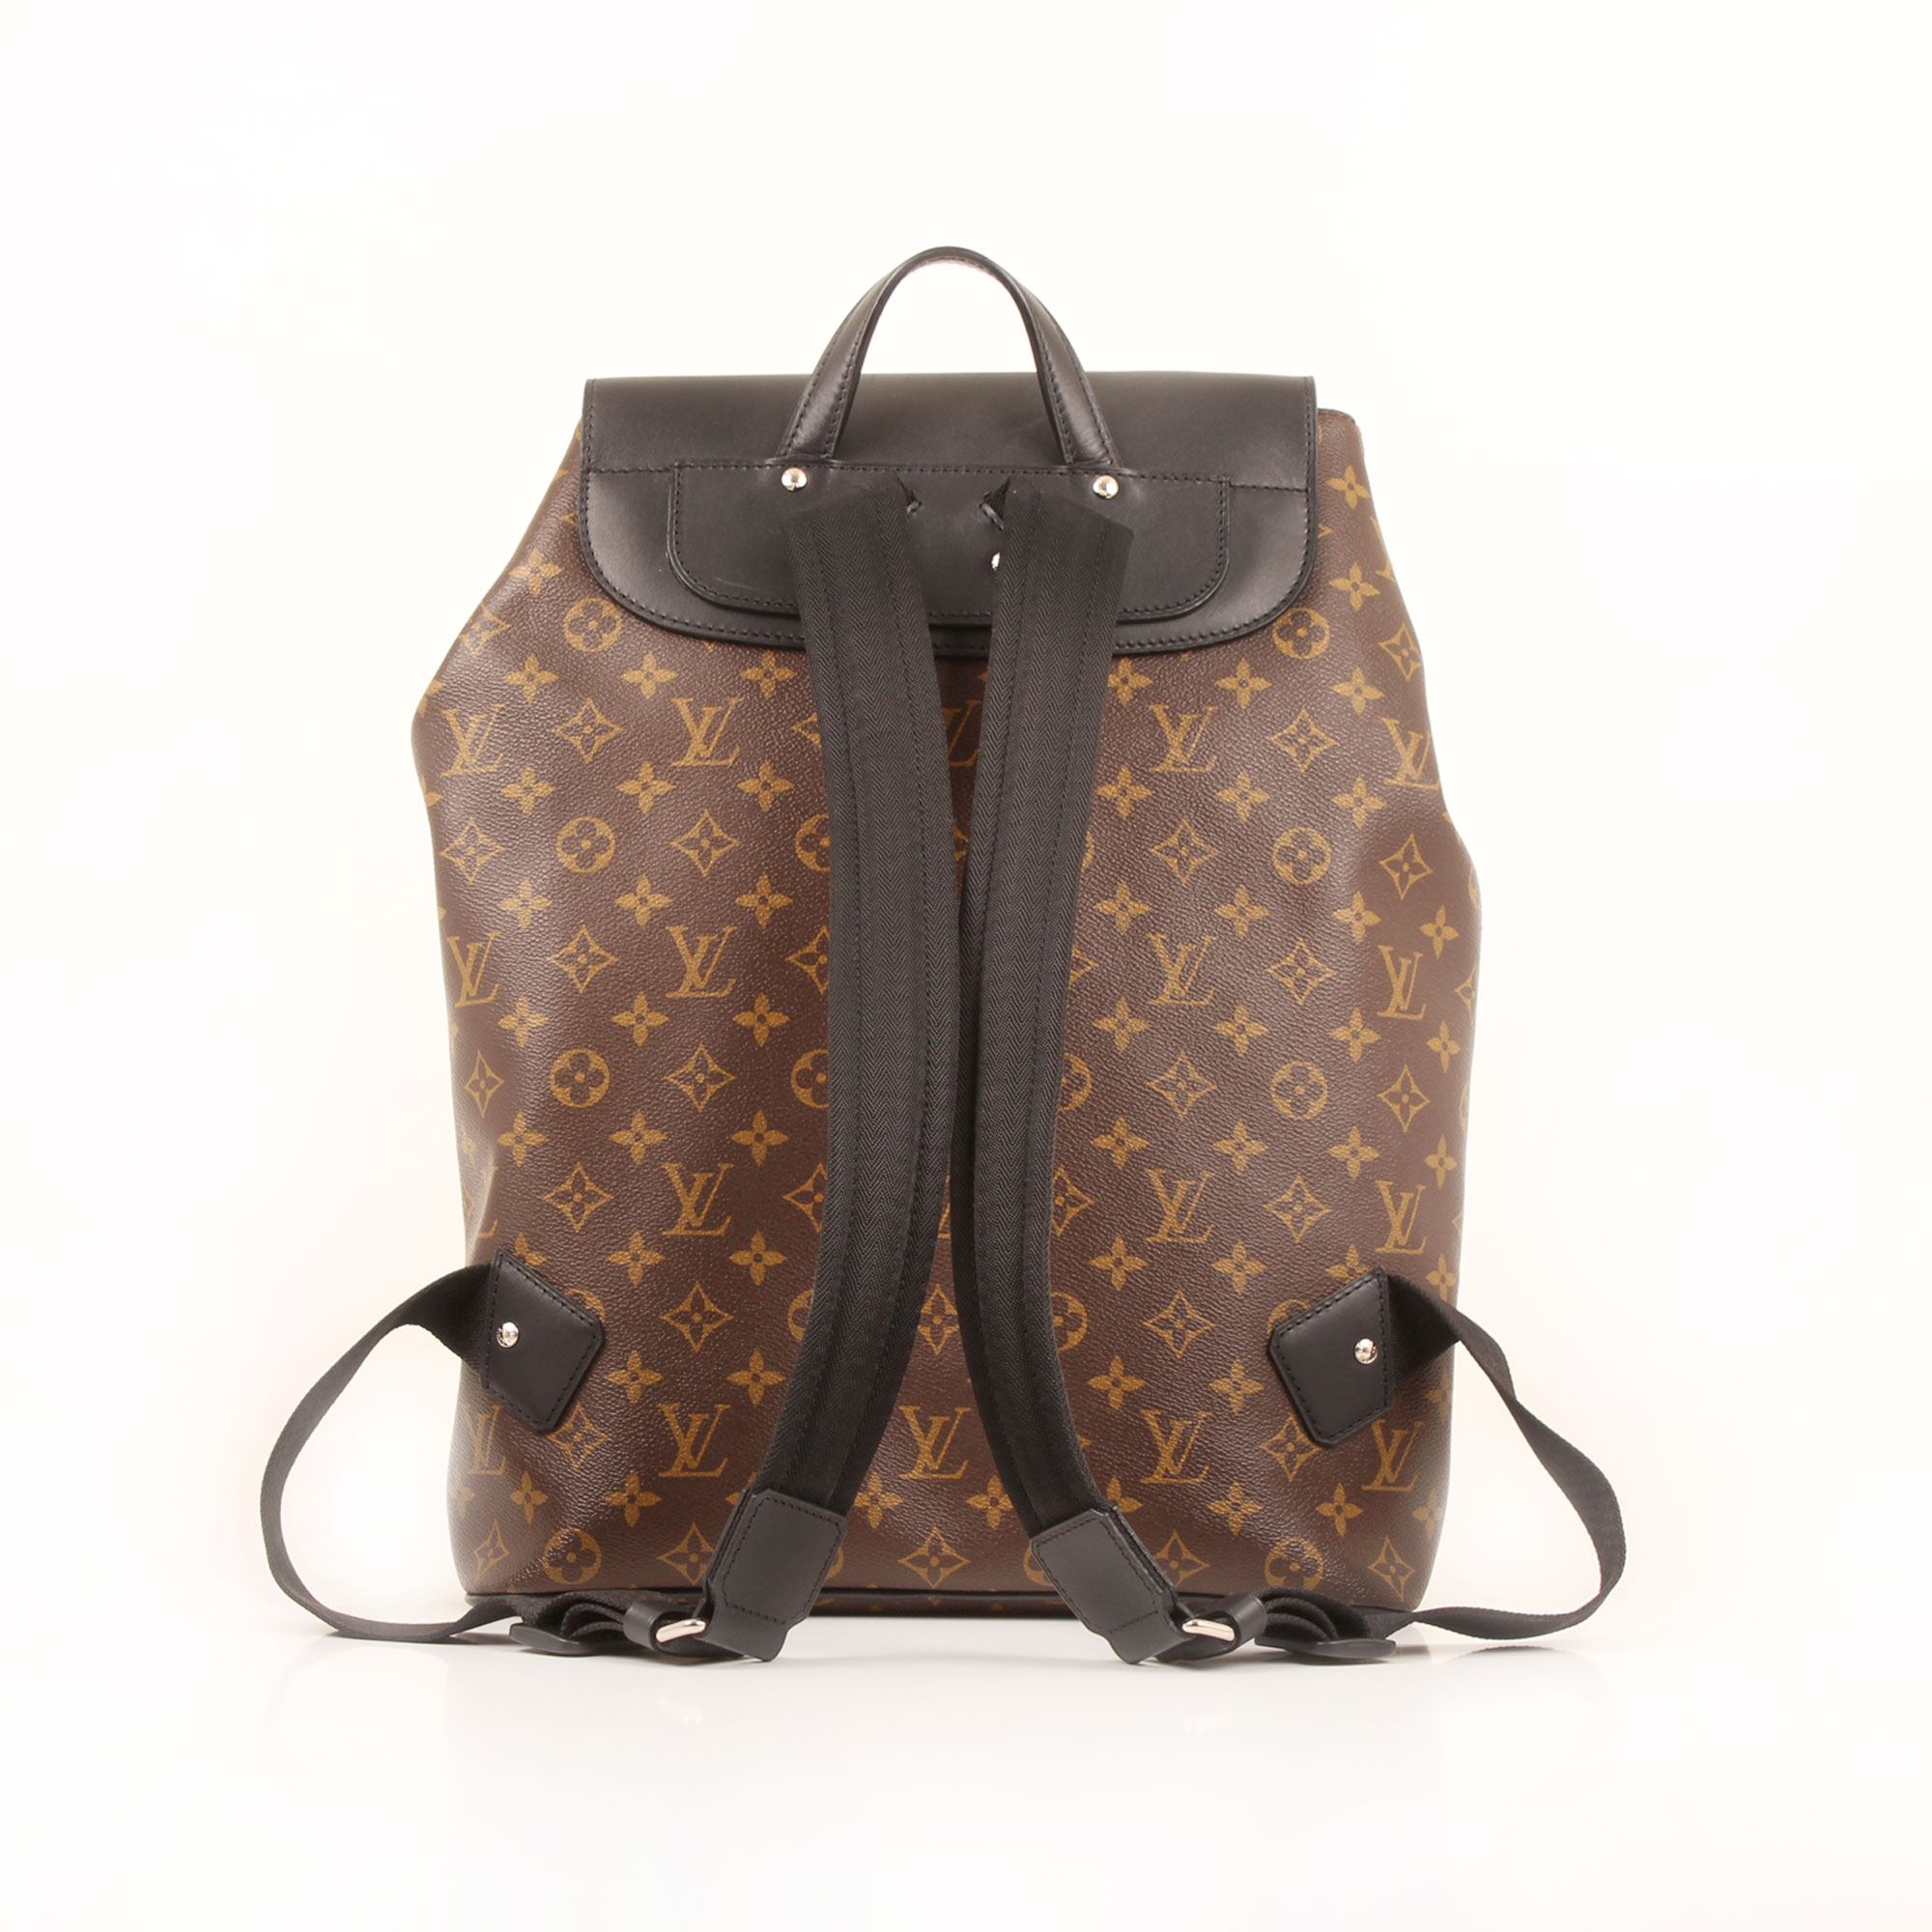 Back image of louis vuitton palk monogram macassar backpack